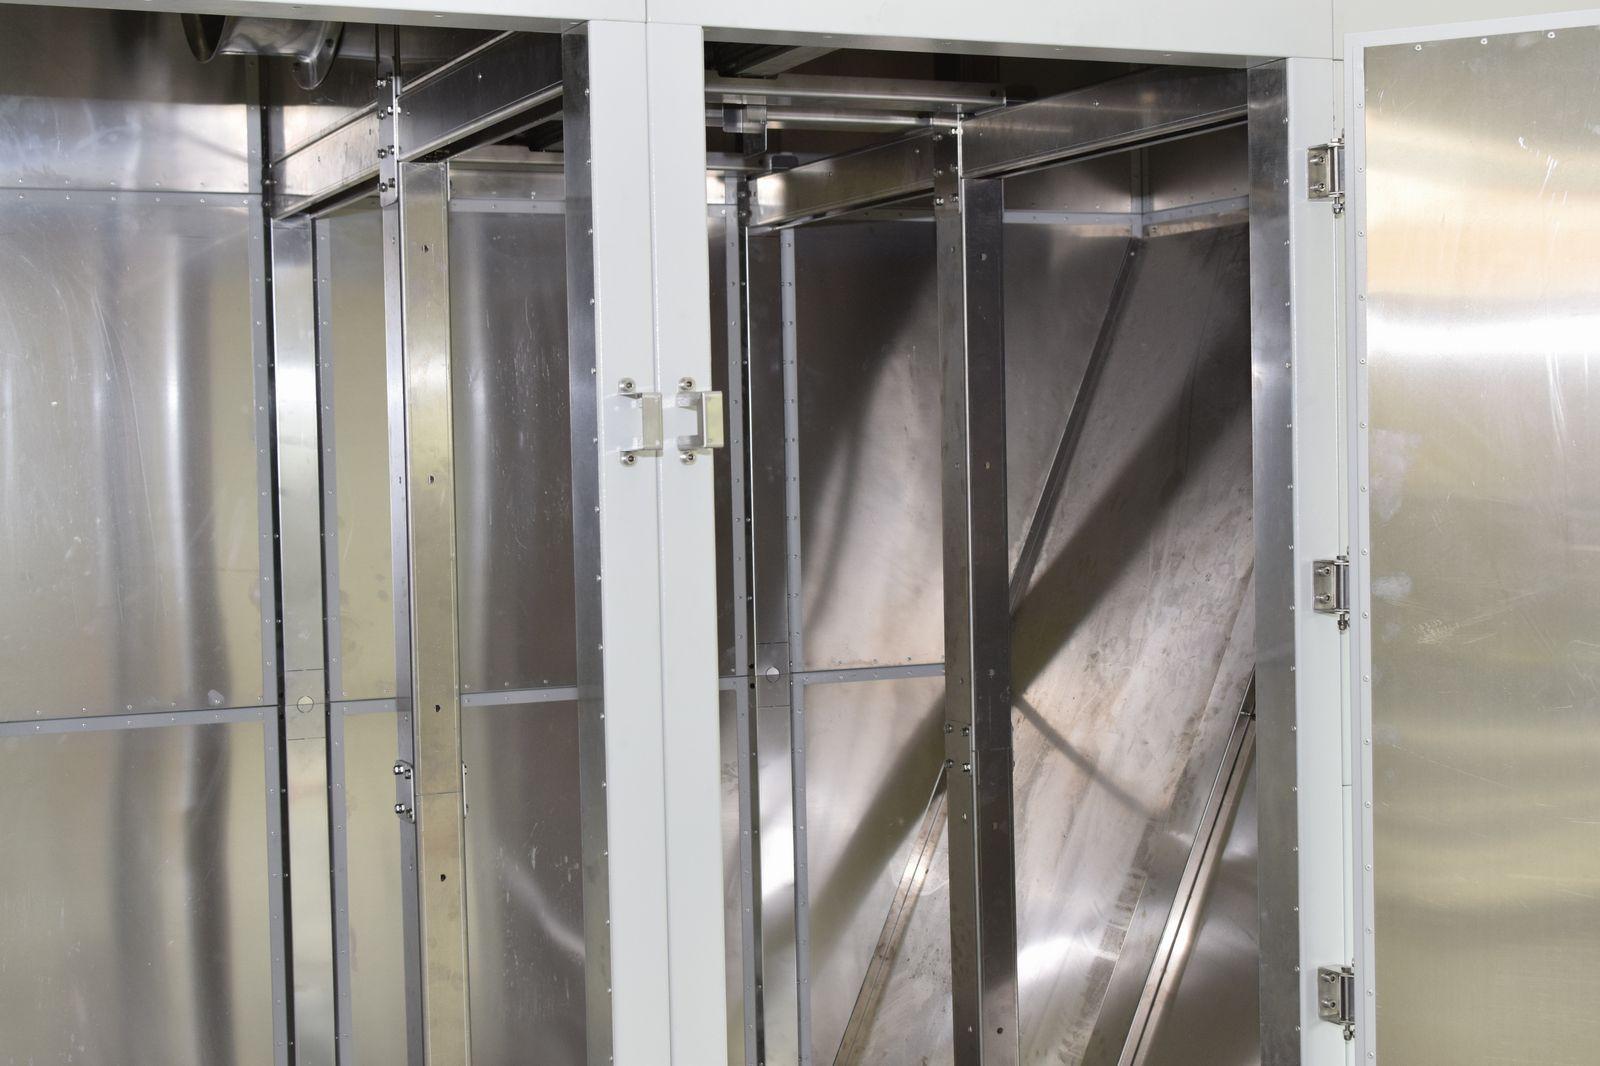 Interior deshidrator